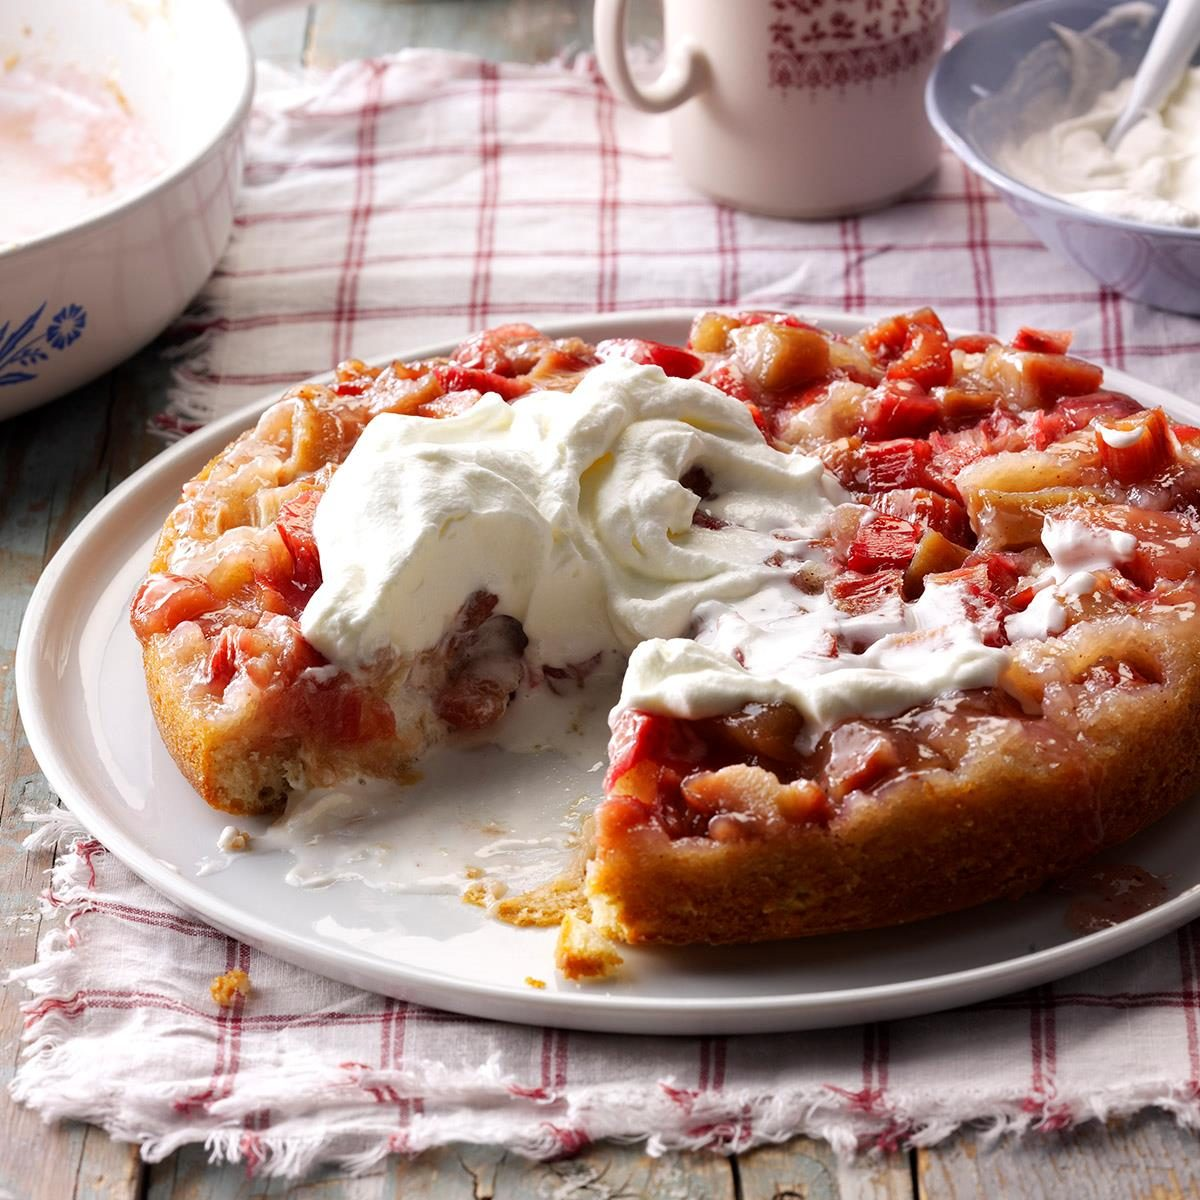 Rhubarb Upside-Down Cake